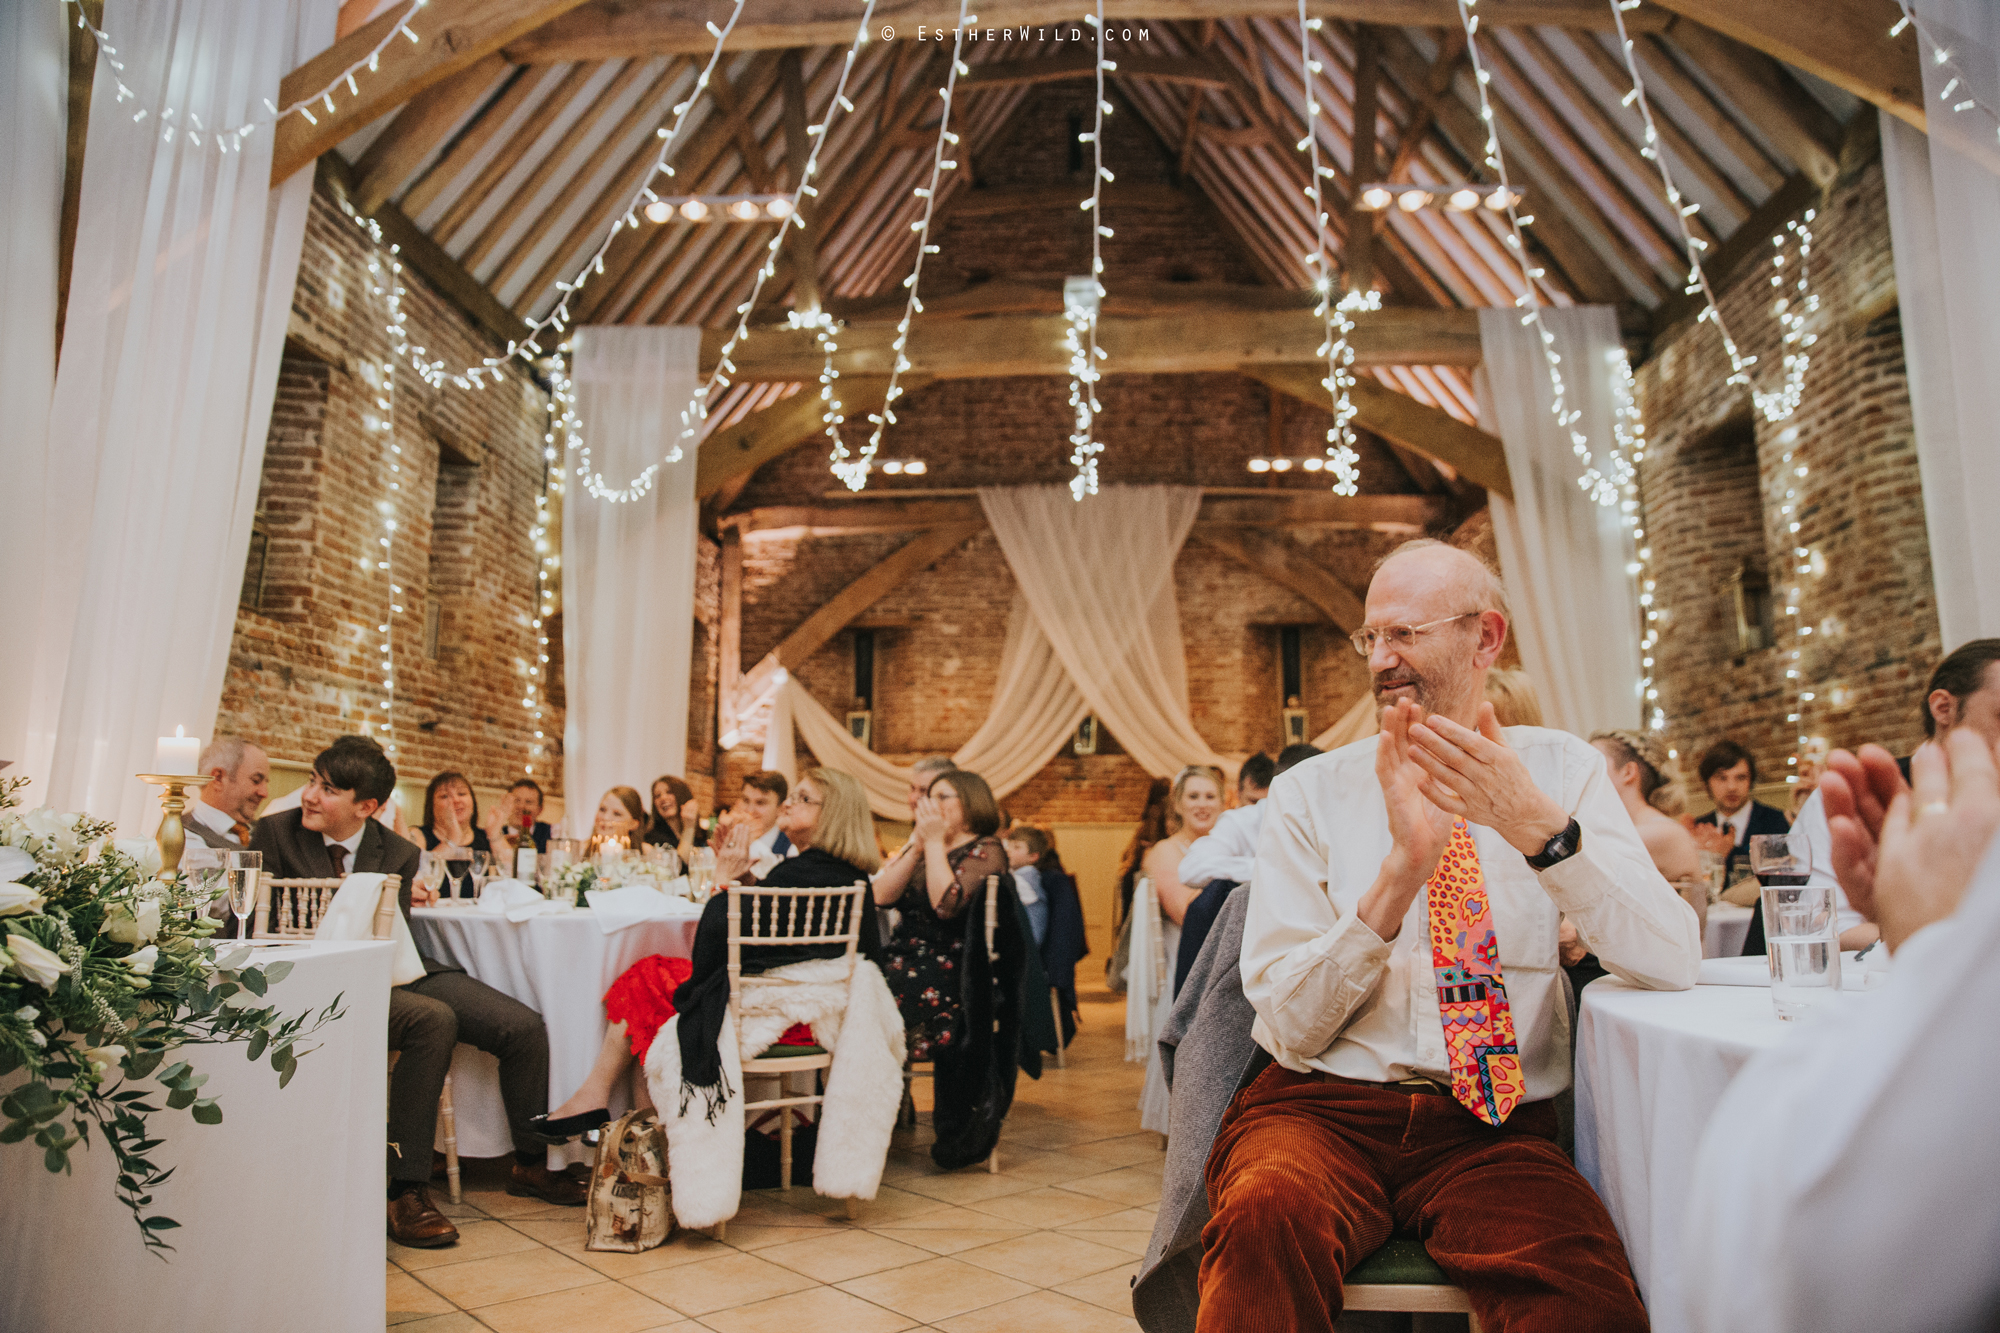 Elms_Barn_Weddings_Suffolk_Photographer_Copyright_Esther_Wild_IMG_2733.jpg